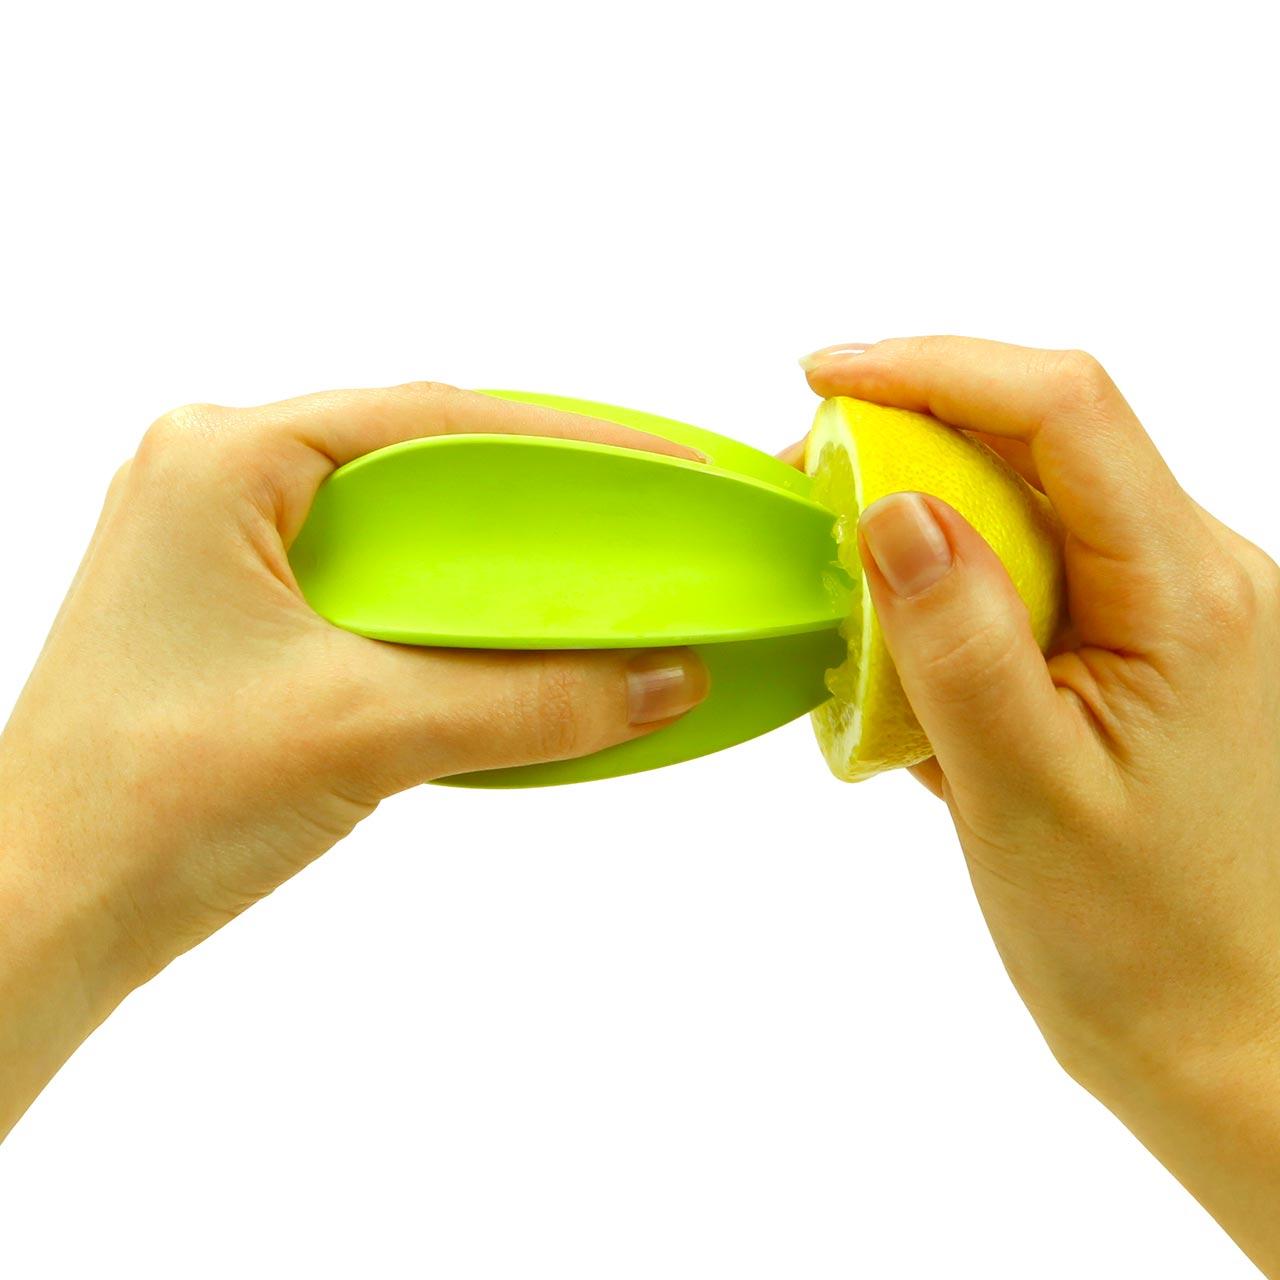 Lemon, Orange or Lime Juicer 'Diego'  Green by COOKUT   The Design Gift Shop